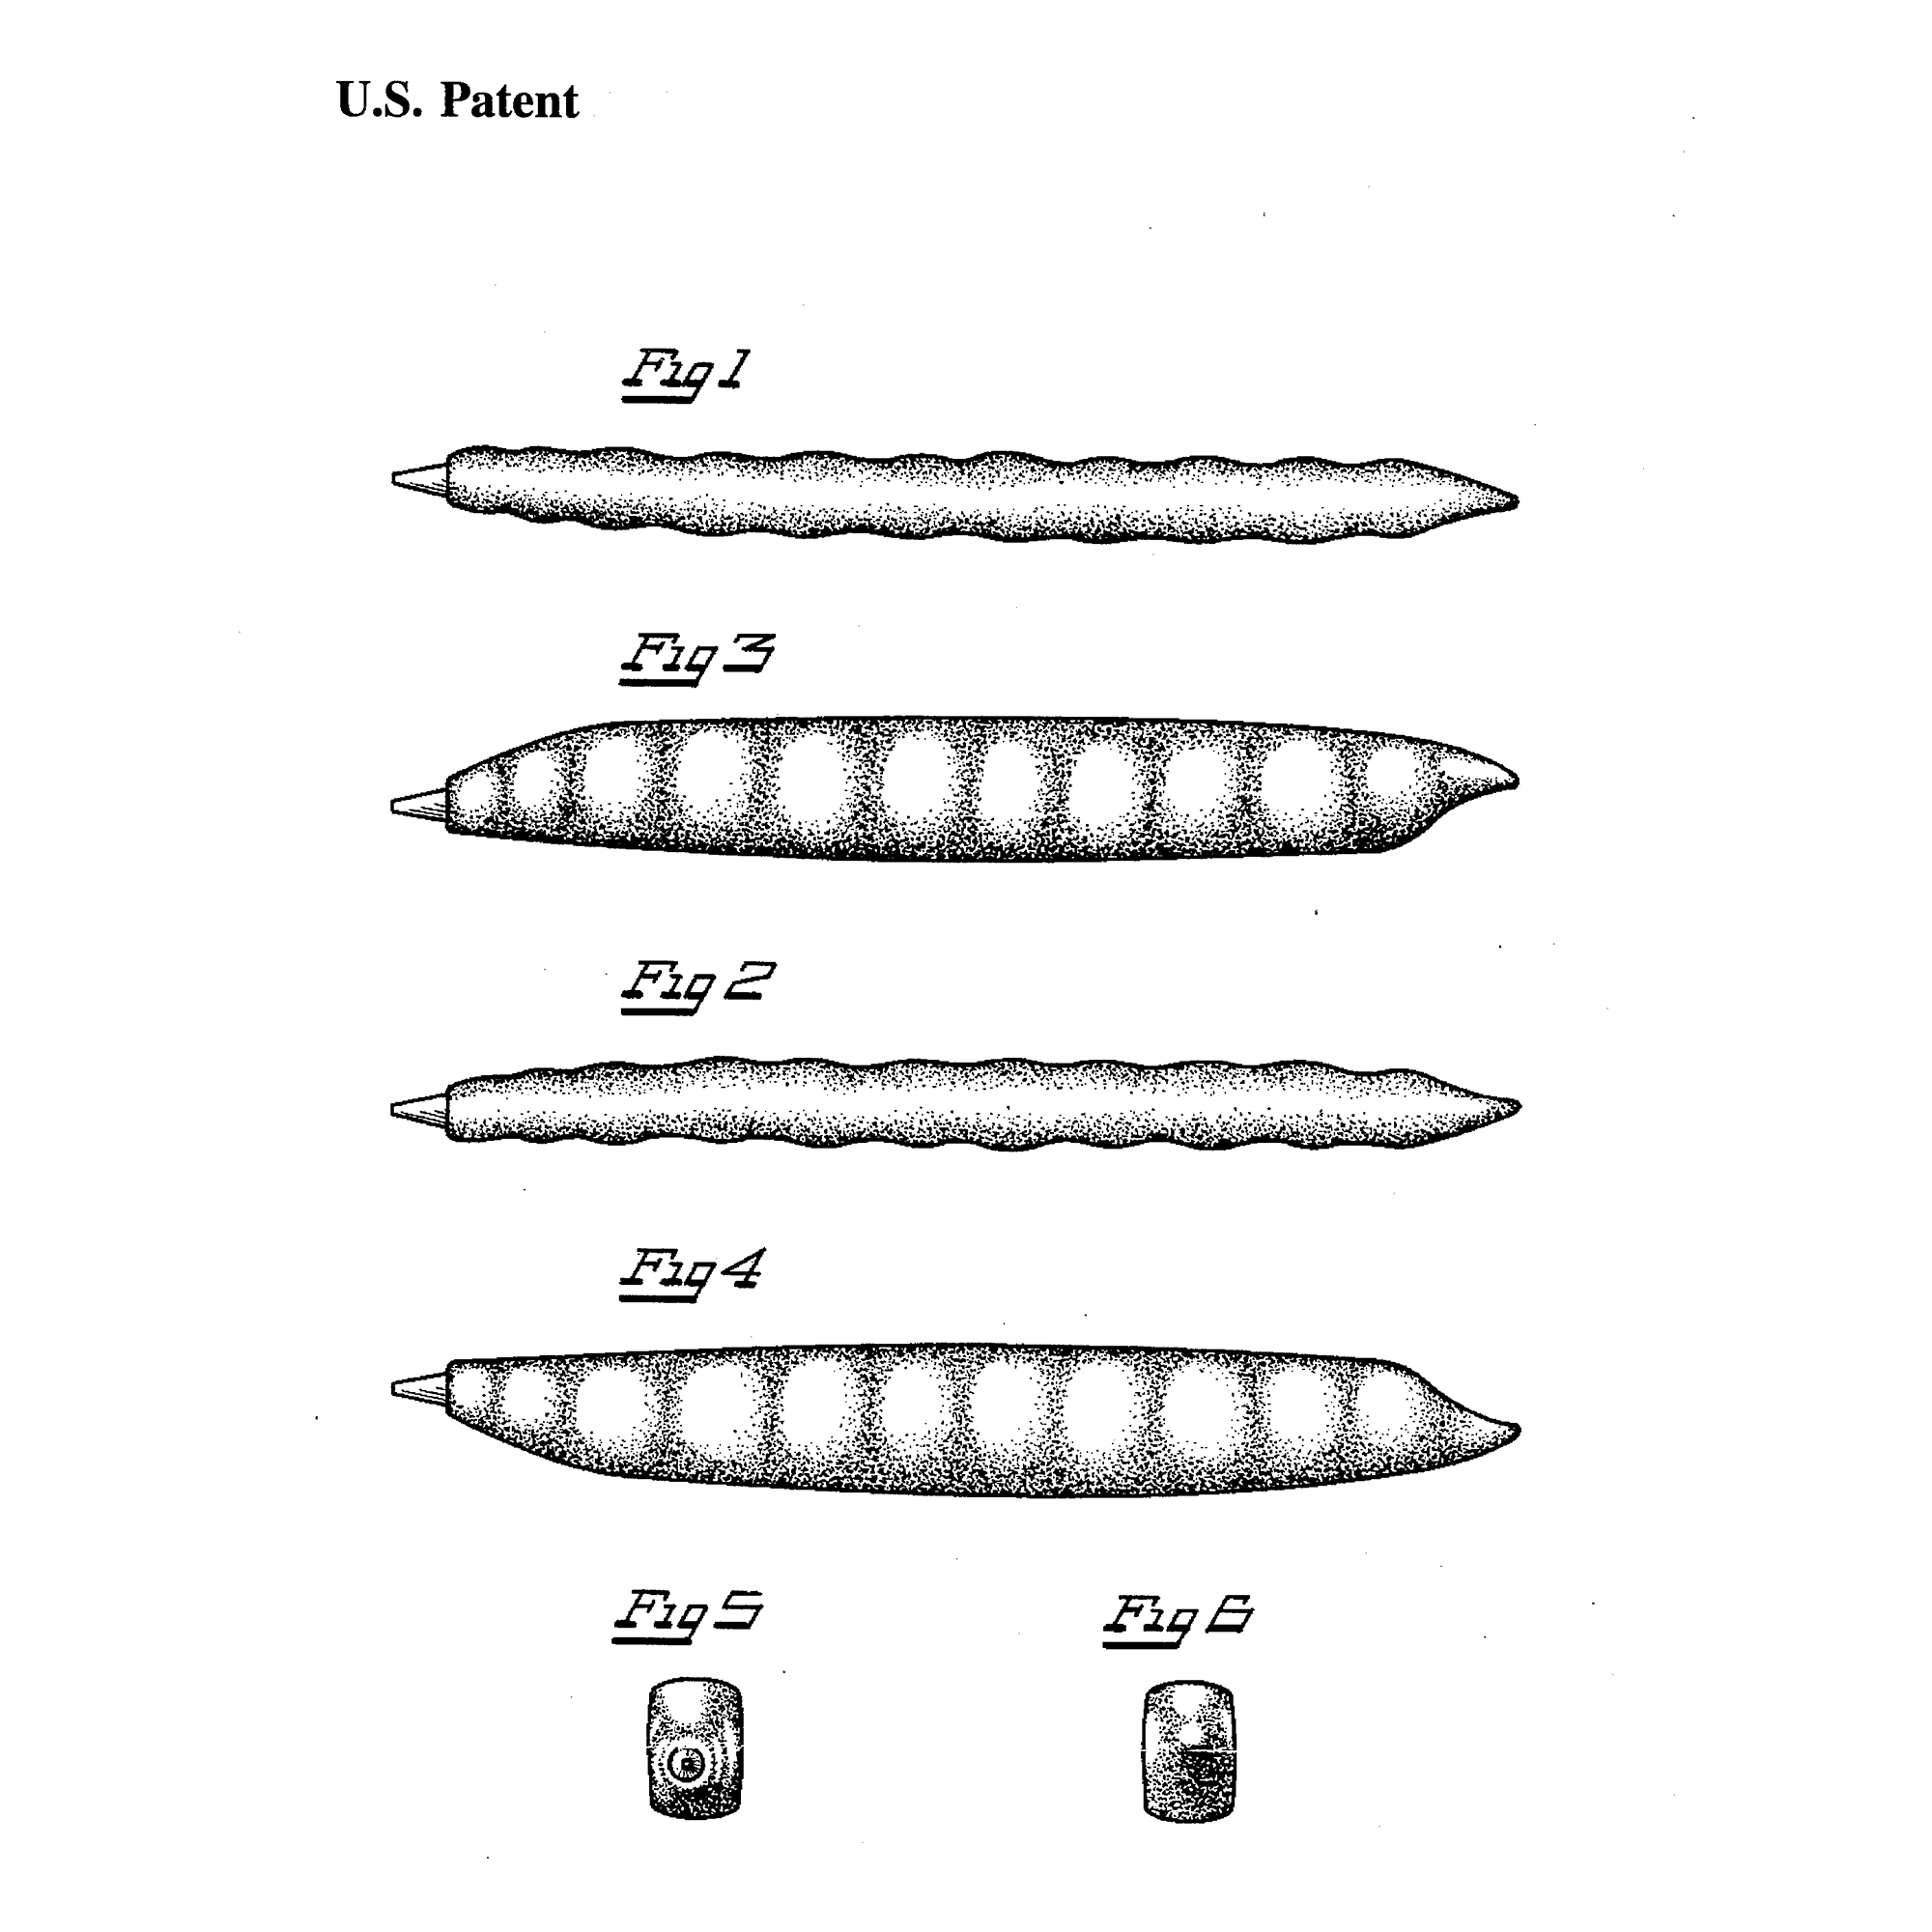 stylo-haricot-2-patent